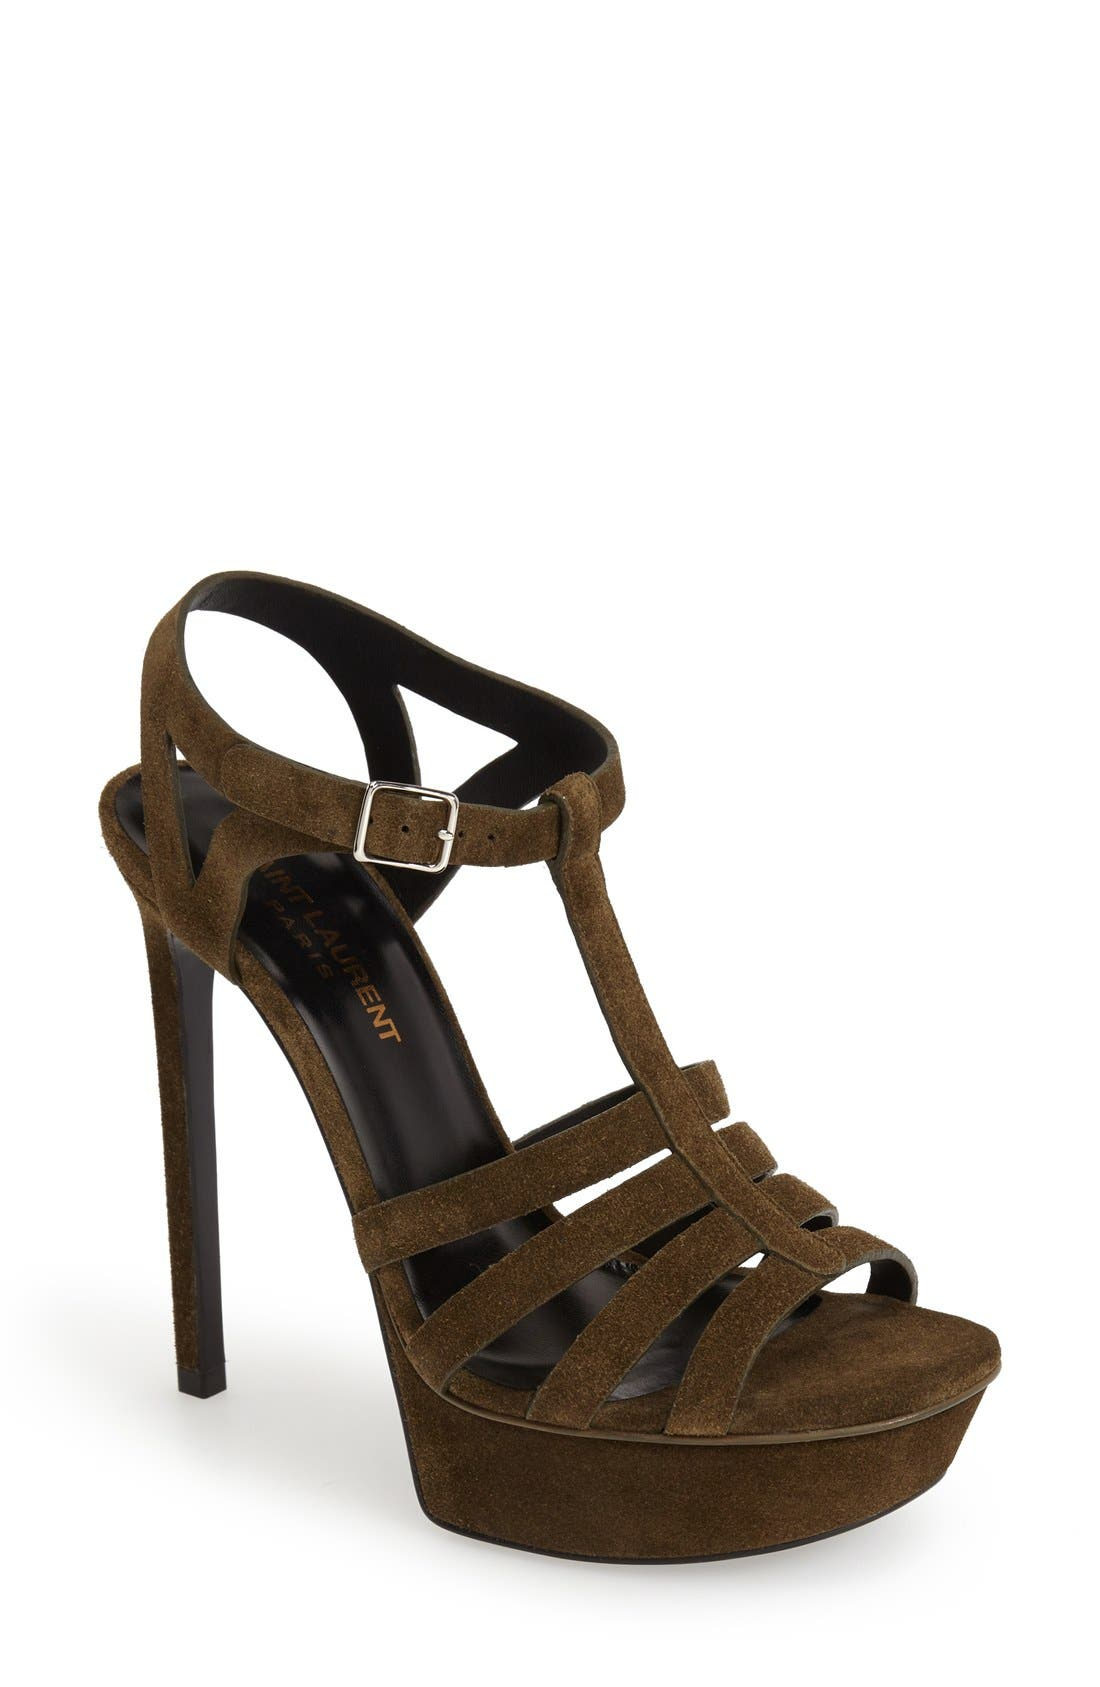 Alternate Image 1 Selected - Saint Laurent 'Bianca' Platform Sandal (Women)